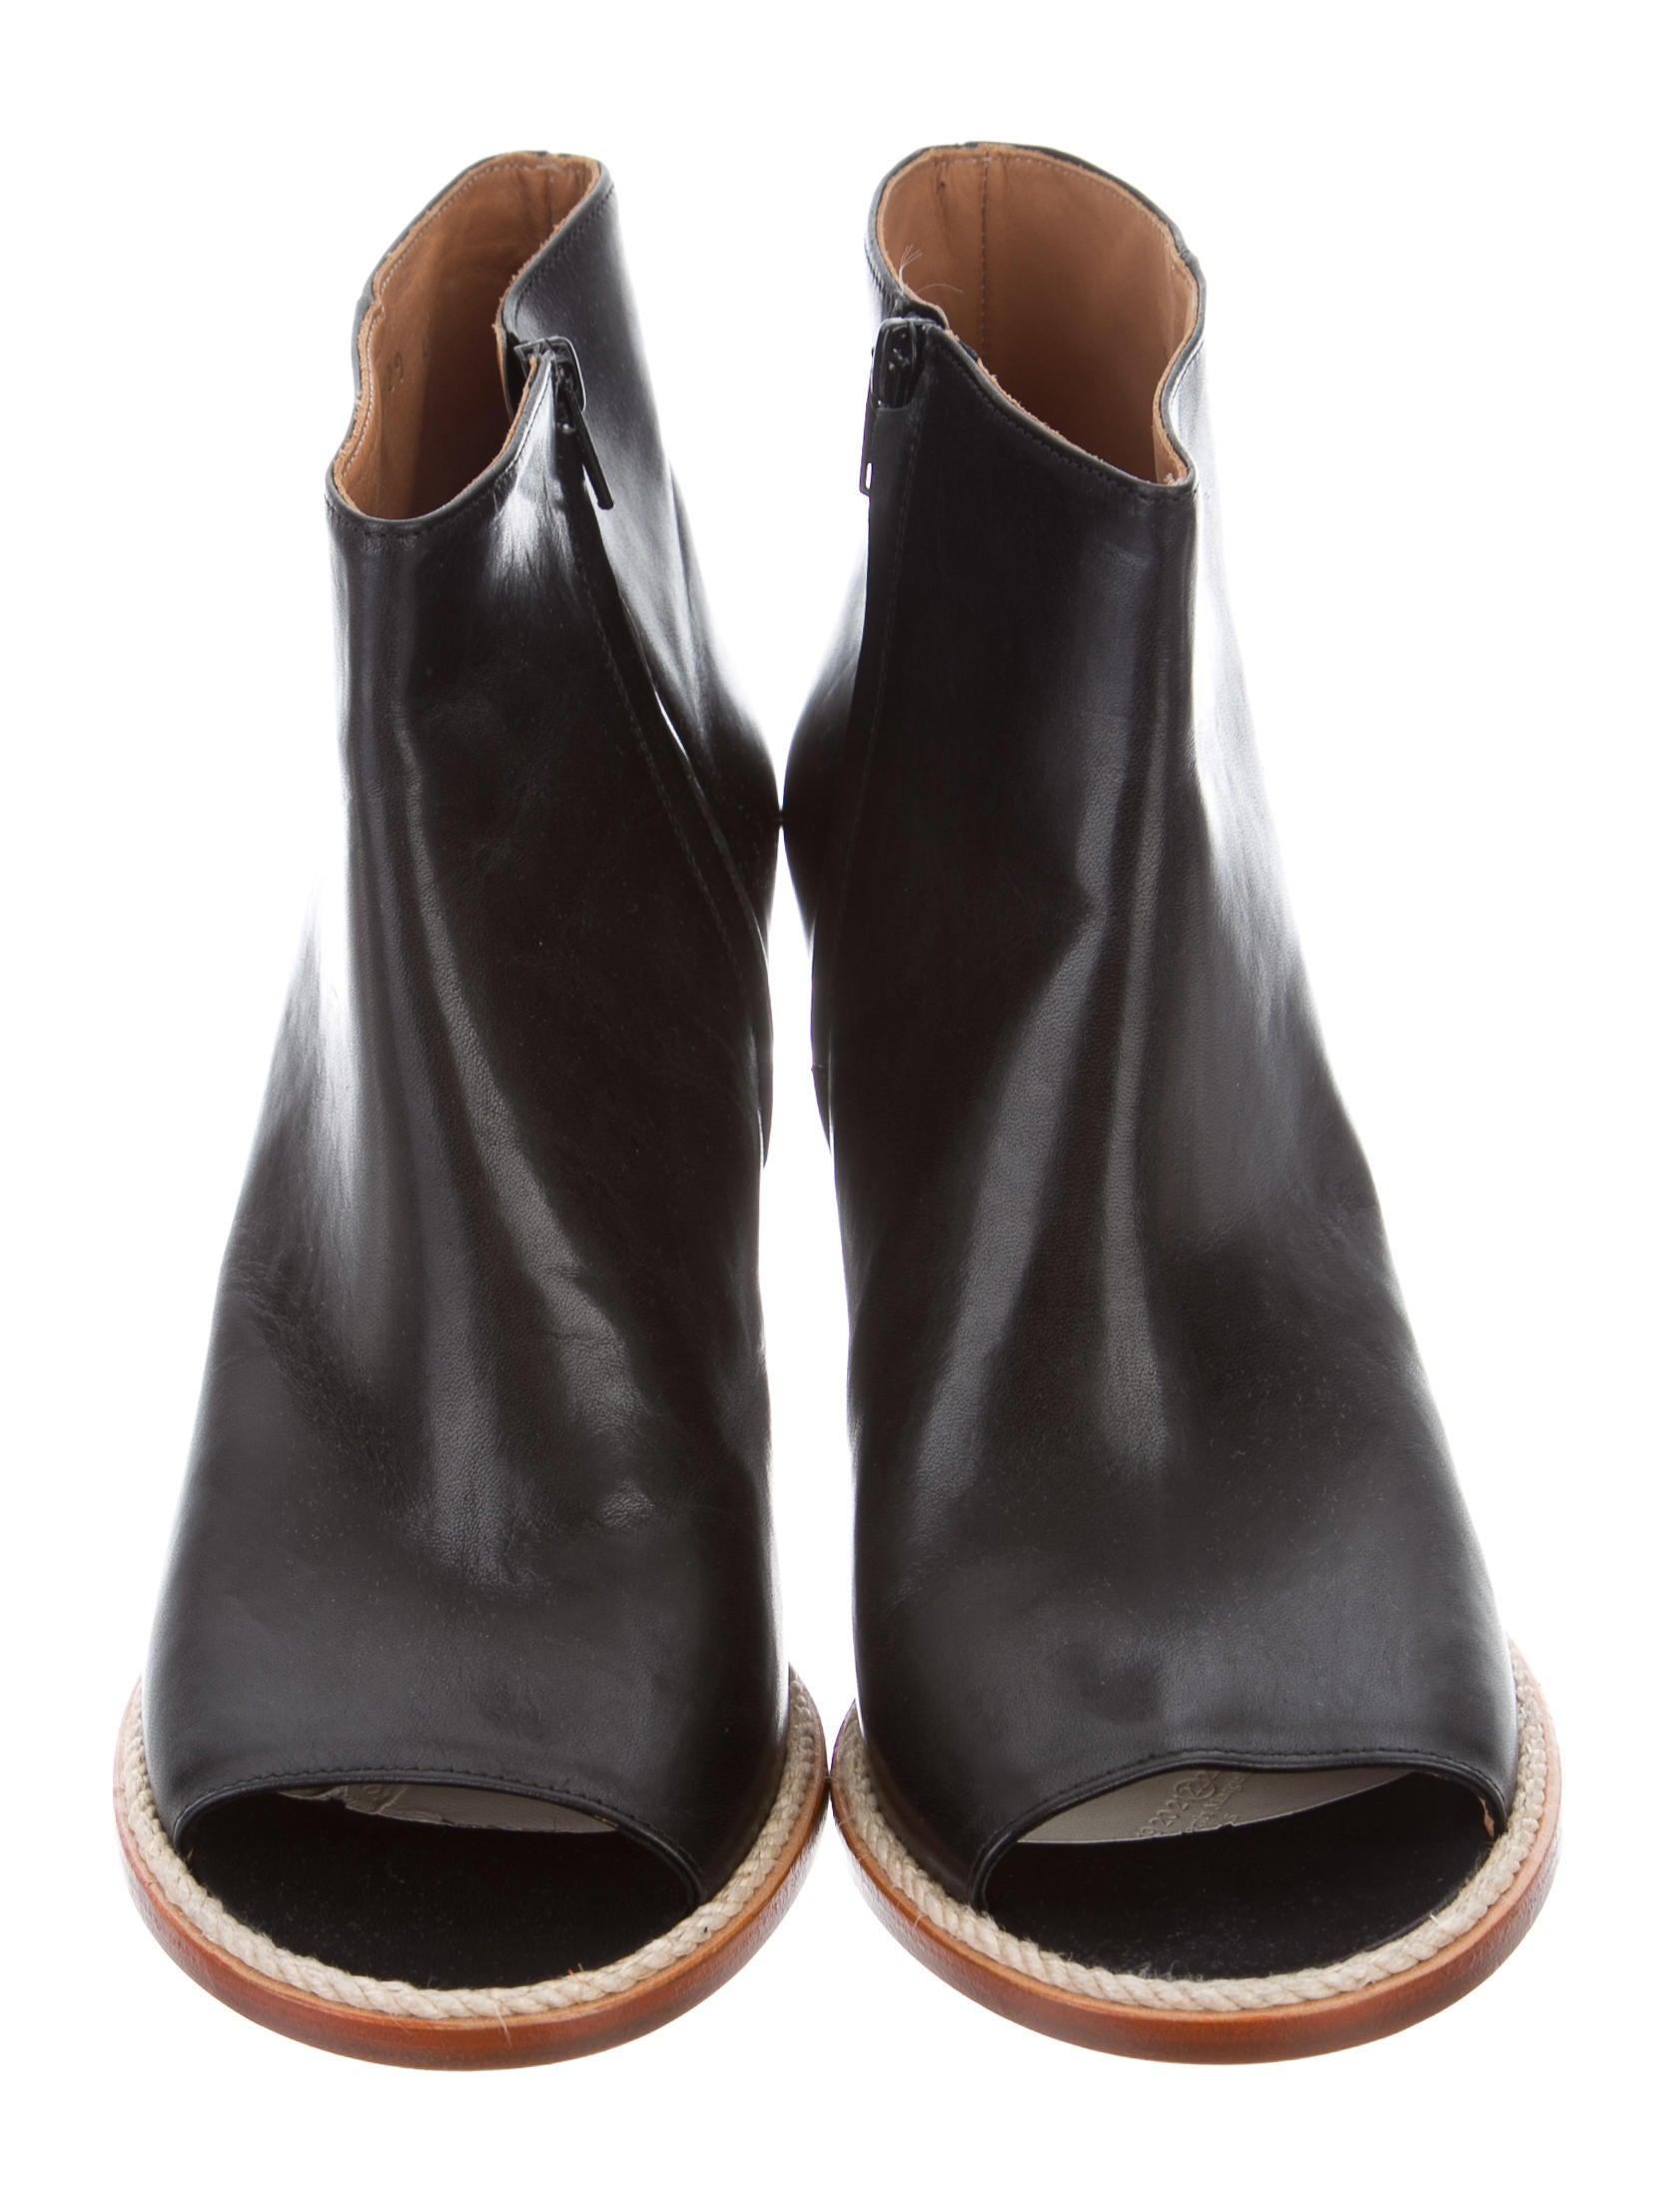 maison margiela peep toe wedge booties shoes mai30680